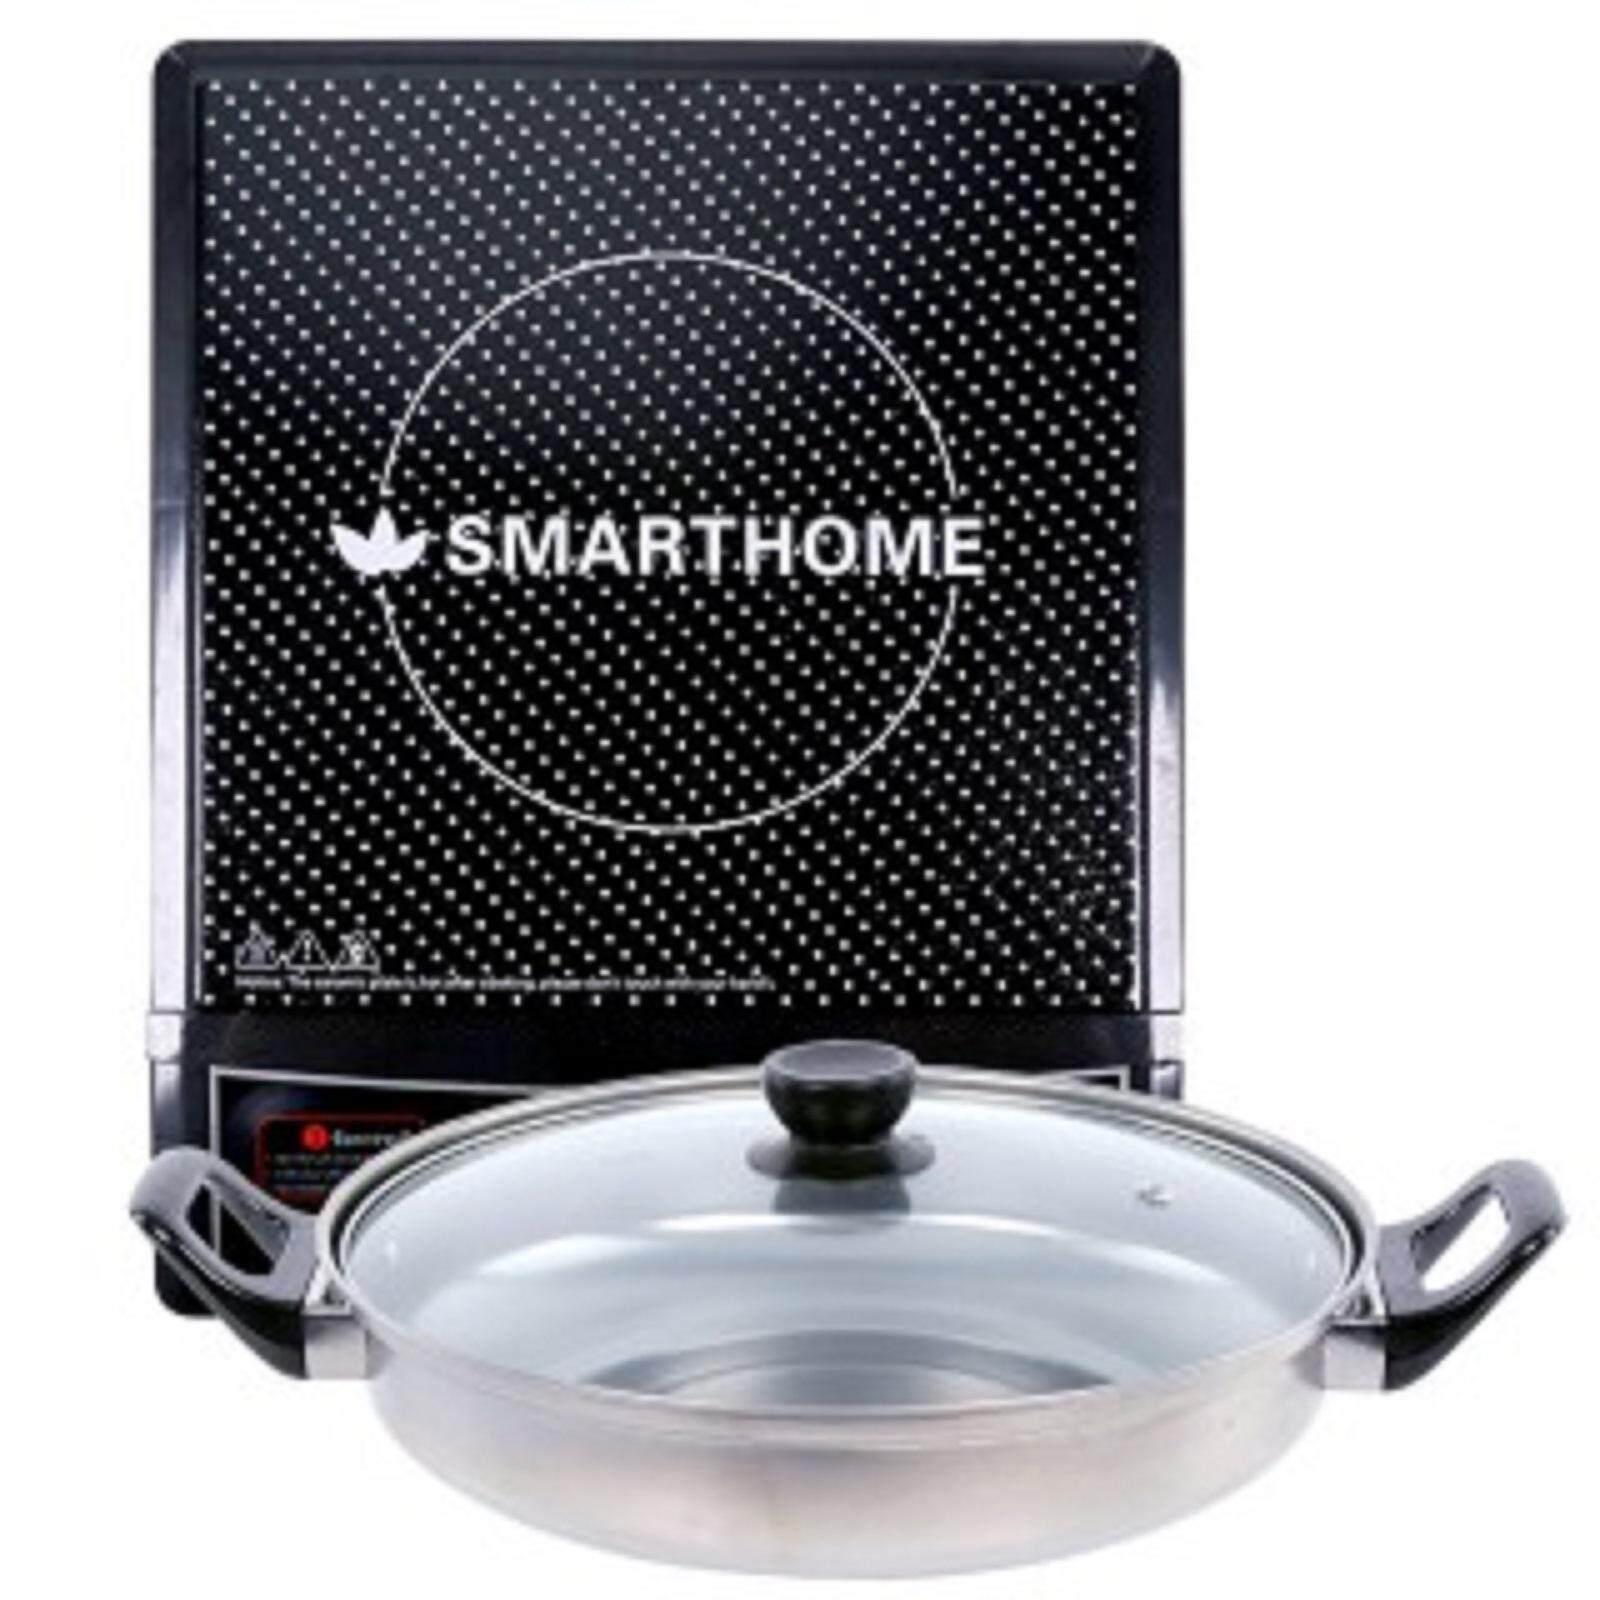 SMARTHOME เตาแม่เหล็กไฟฟ้า พร้อมหม้อสแตนเลส รุ่น WPA-2009/IN-1200